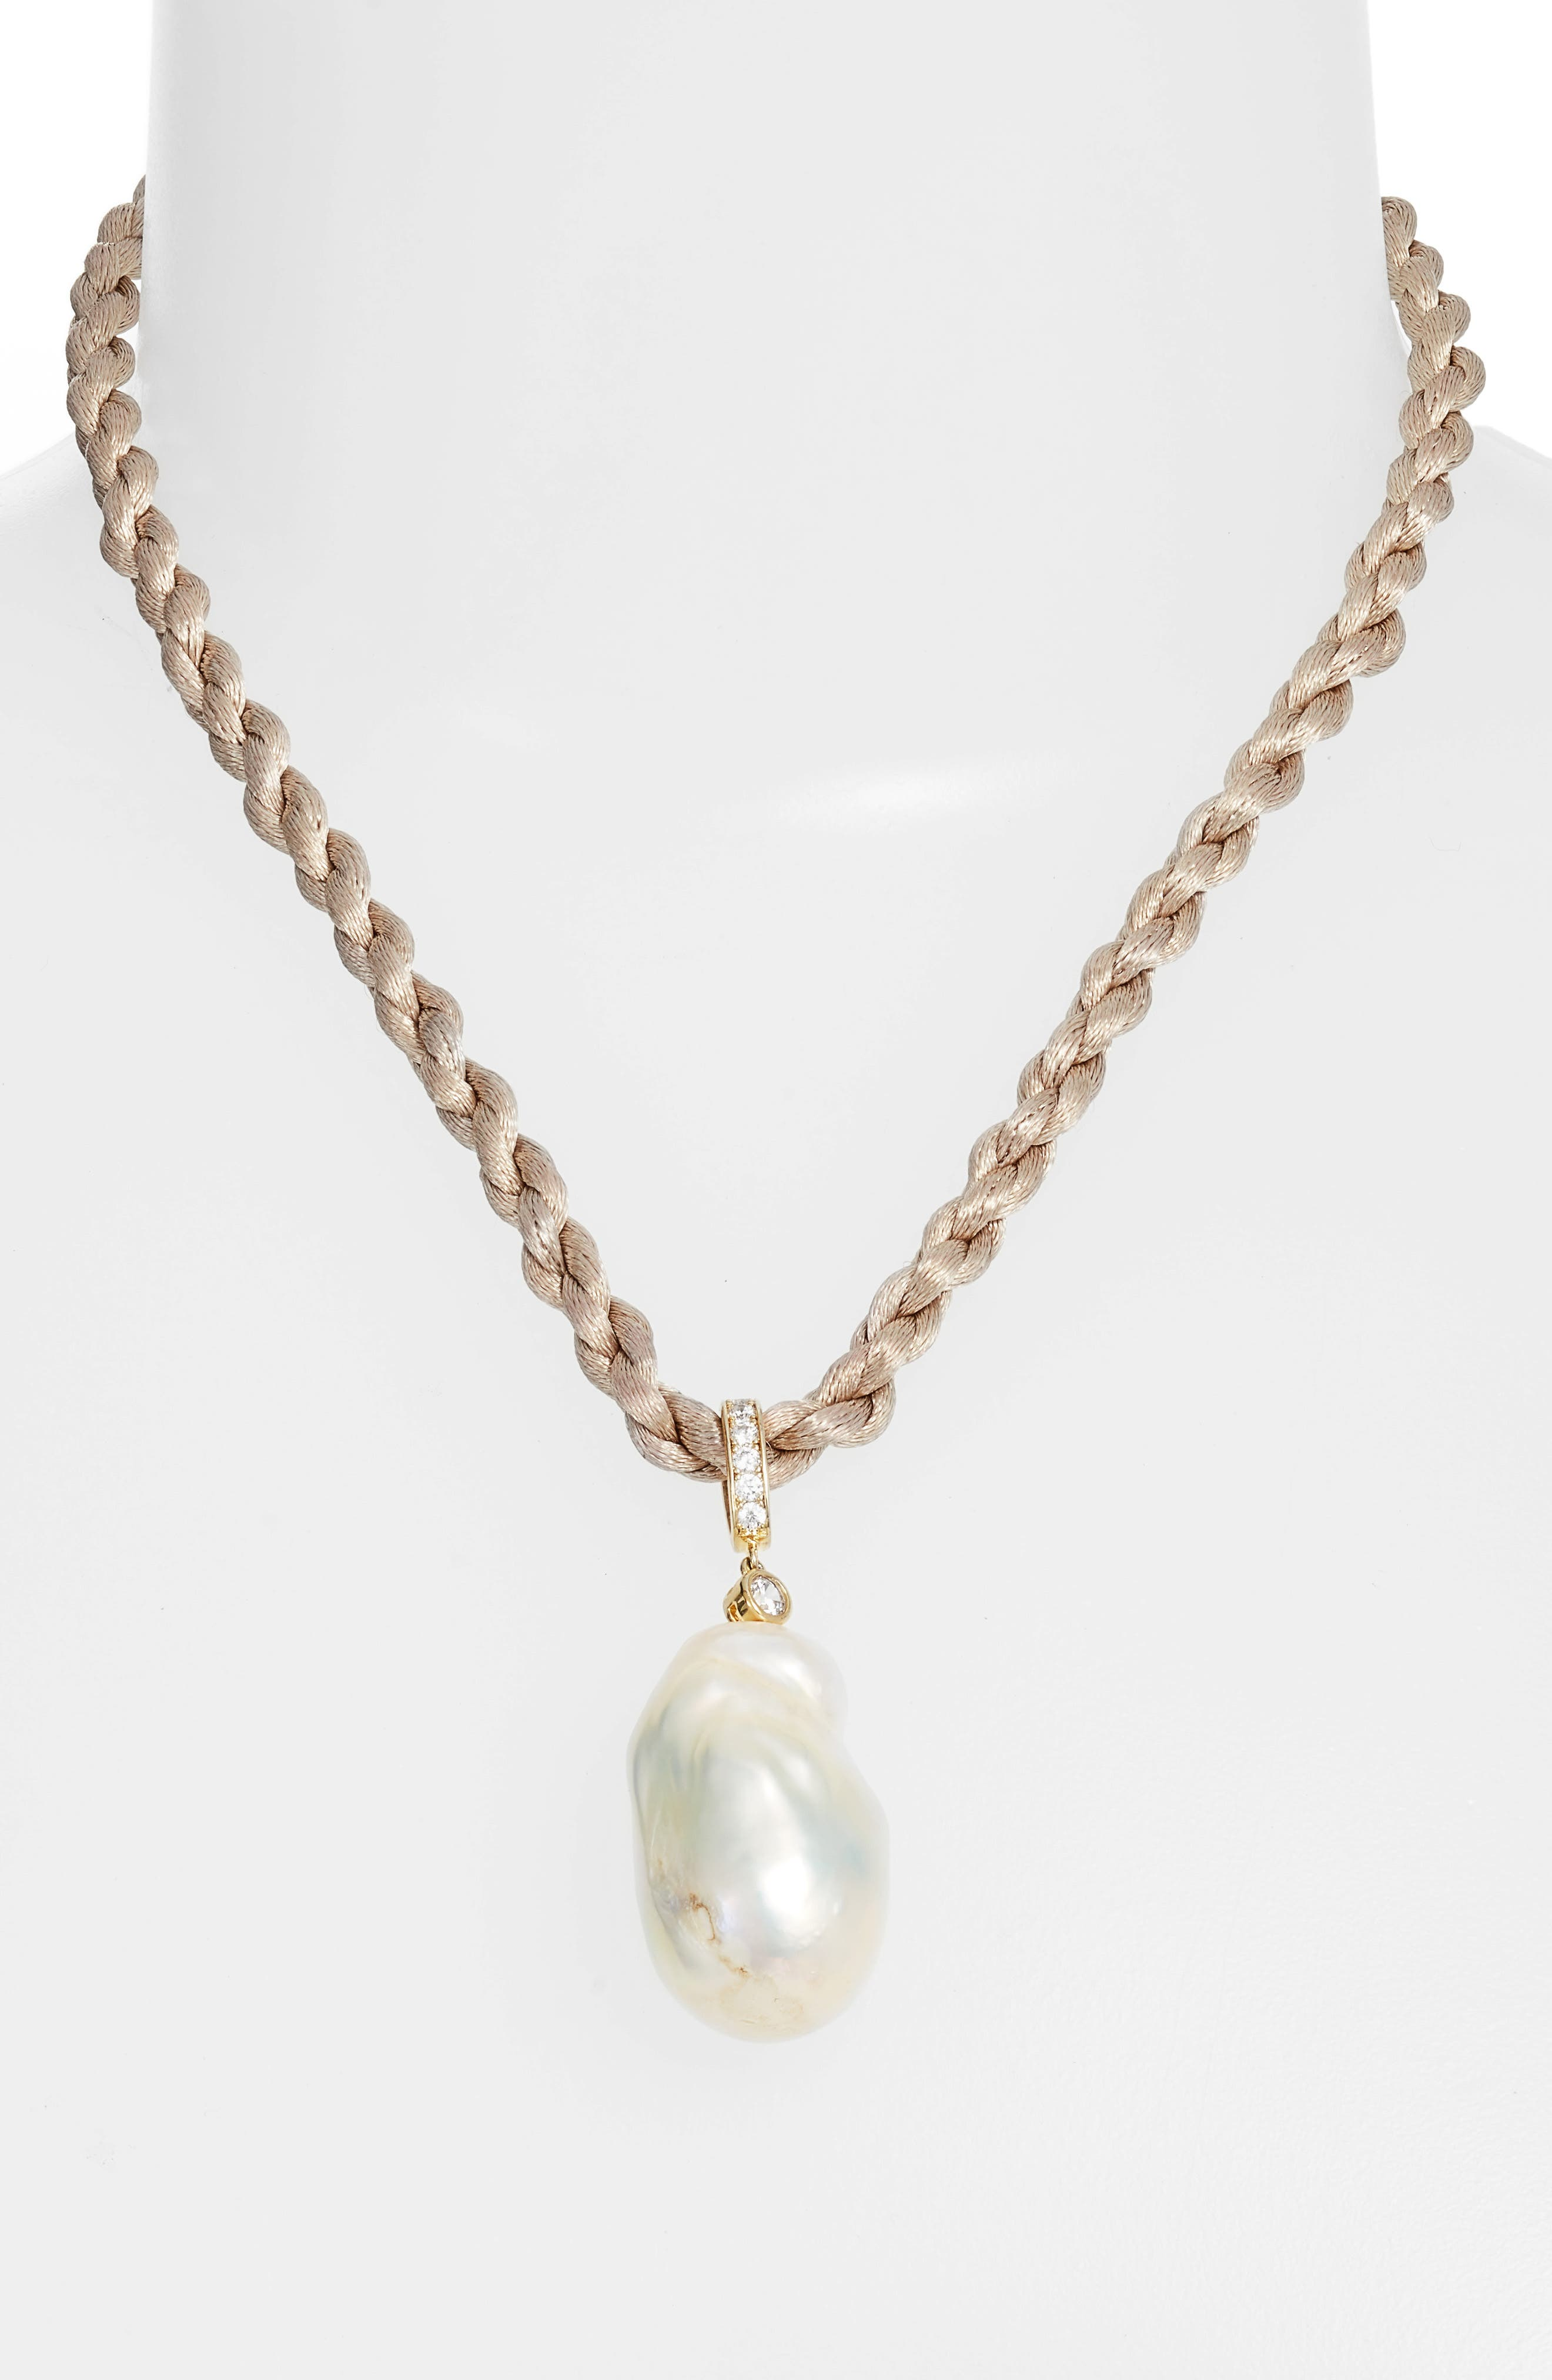 Baroque Freshwater Pearl & Cubic Zirconia Pendant Necklace,                             Alternate thumbnail 2, color,                             GOLD/ KHAKI/ PEARL/ WHITE CZ